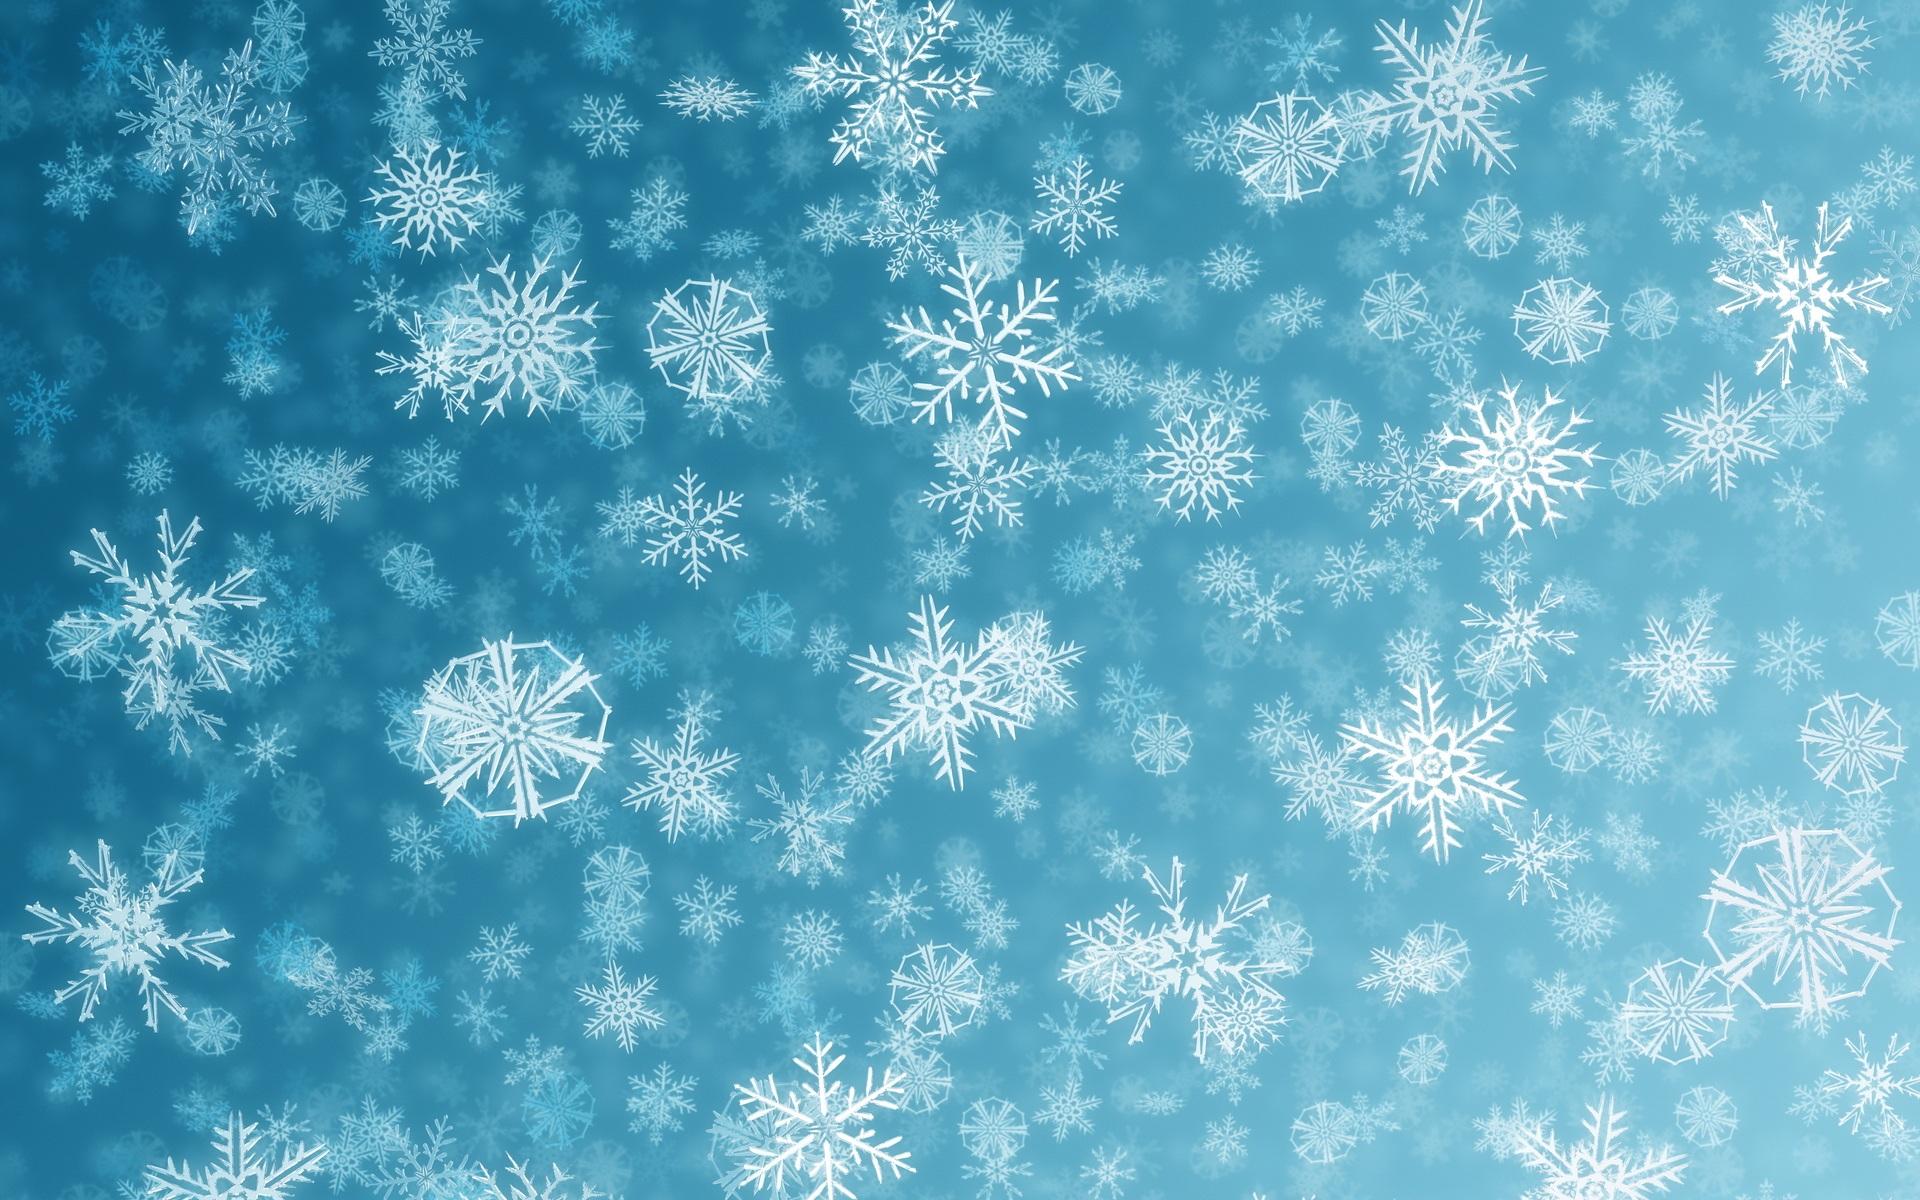 Snowflake Wallpaper (33 Wallpapers)